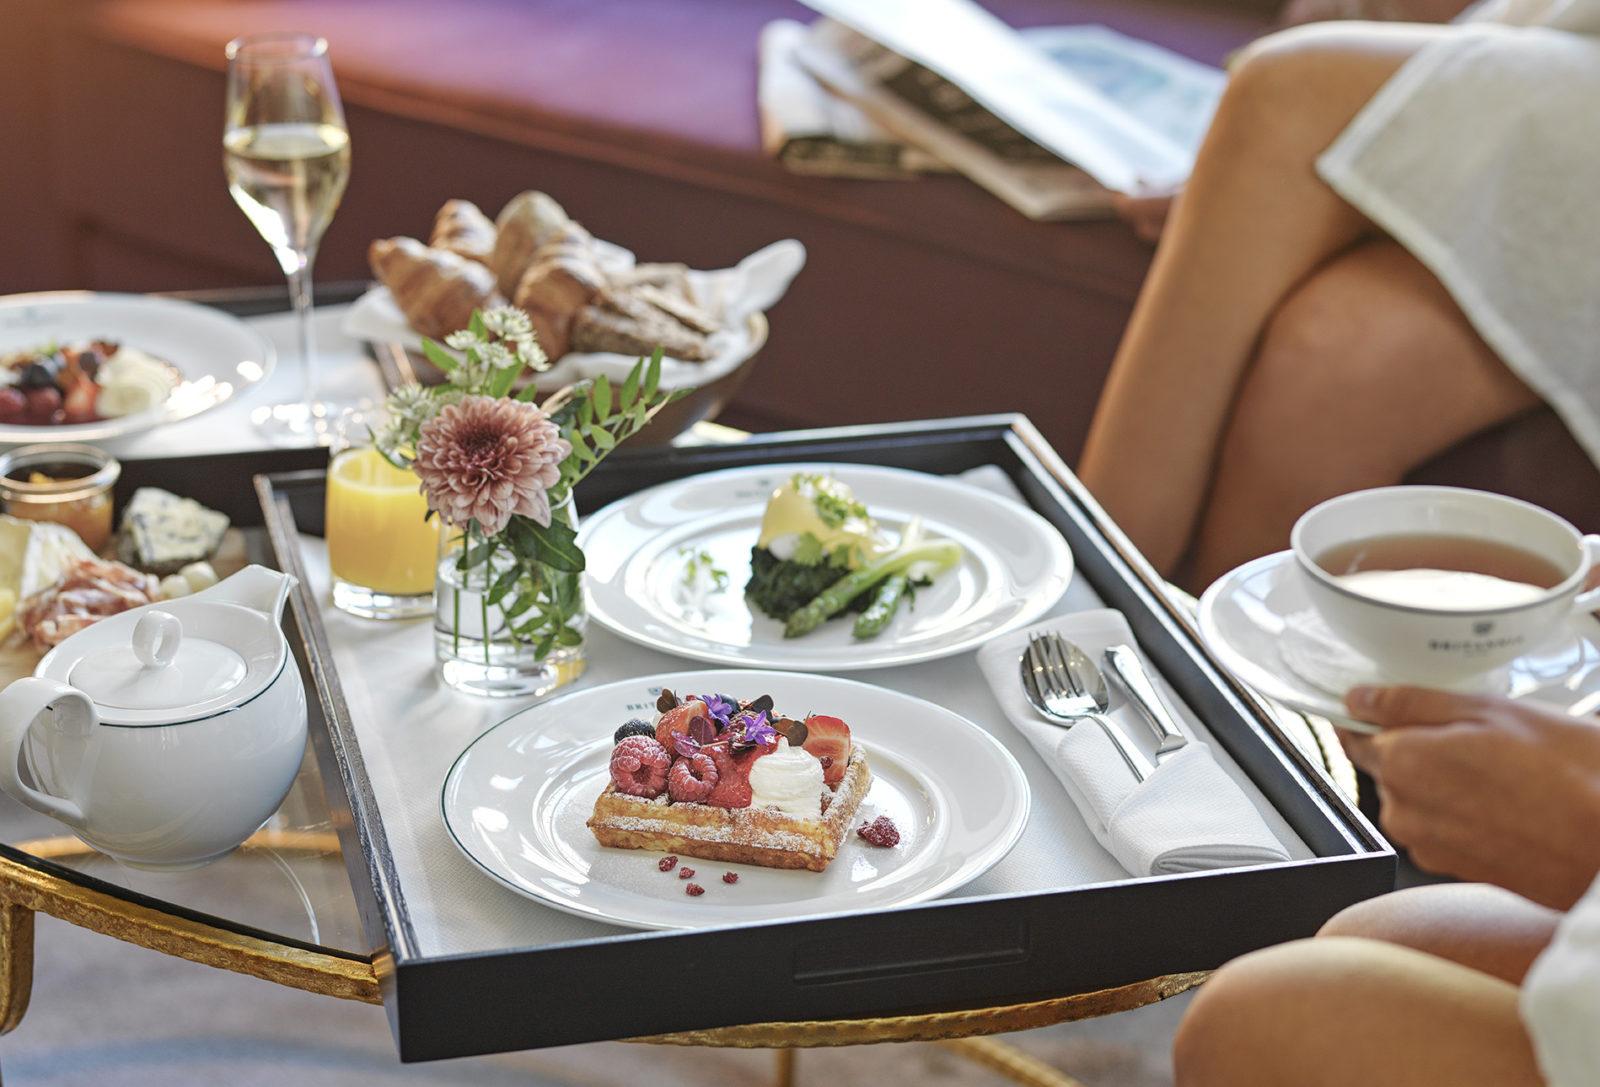 Britannia Hotel in room dining breakfast spread